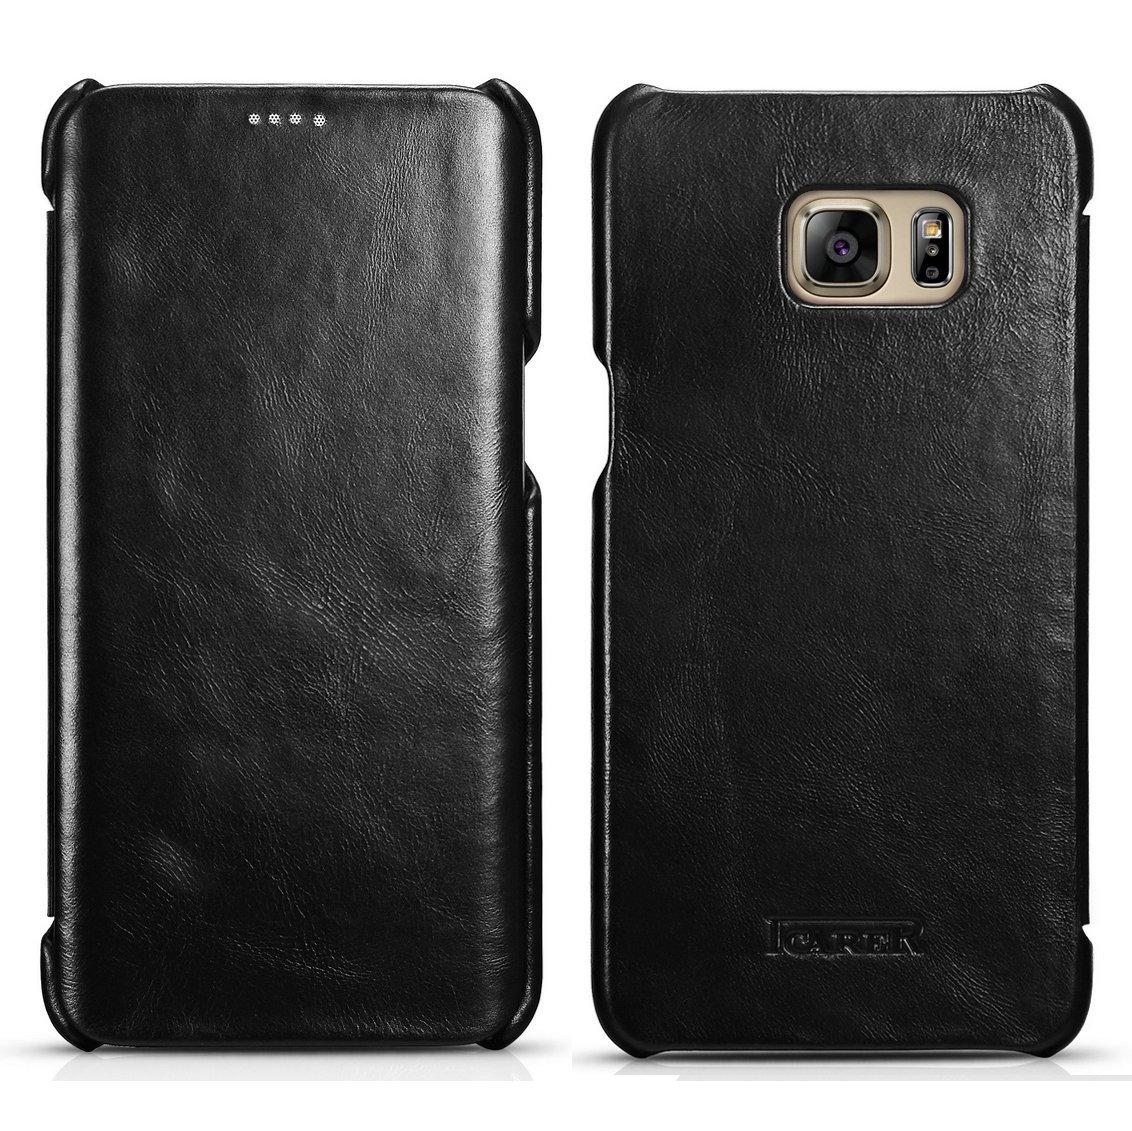 iCarer Vintage Series Side-Open Δερμάτινη Θήκη Samsung Galaxy S6 Edge - Black (10148)